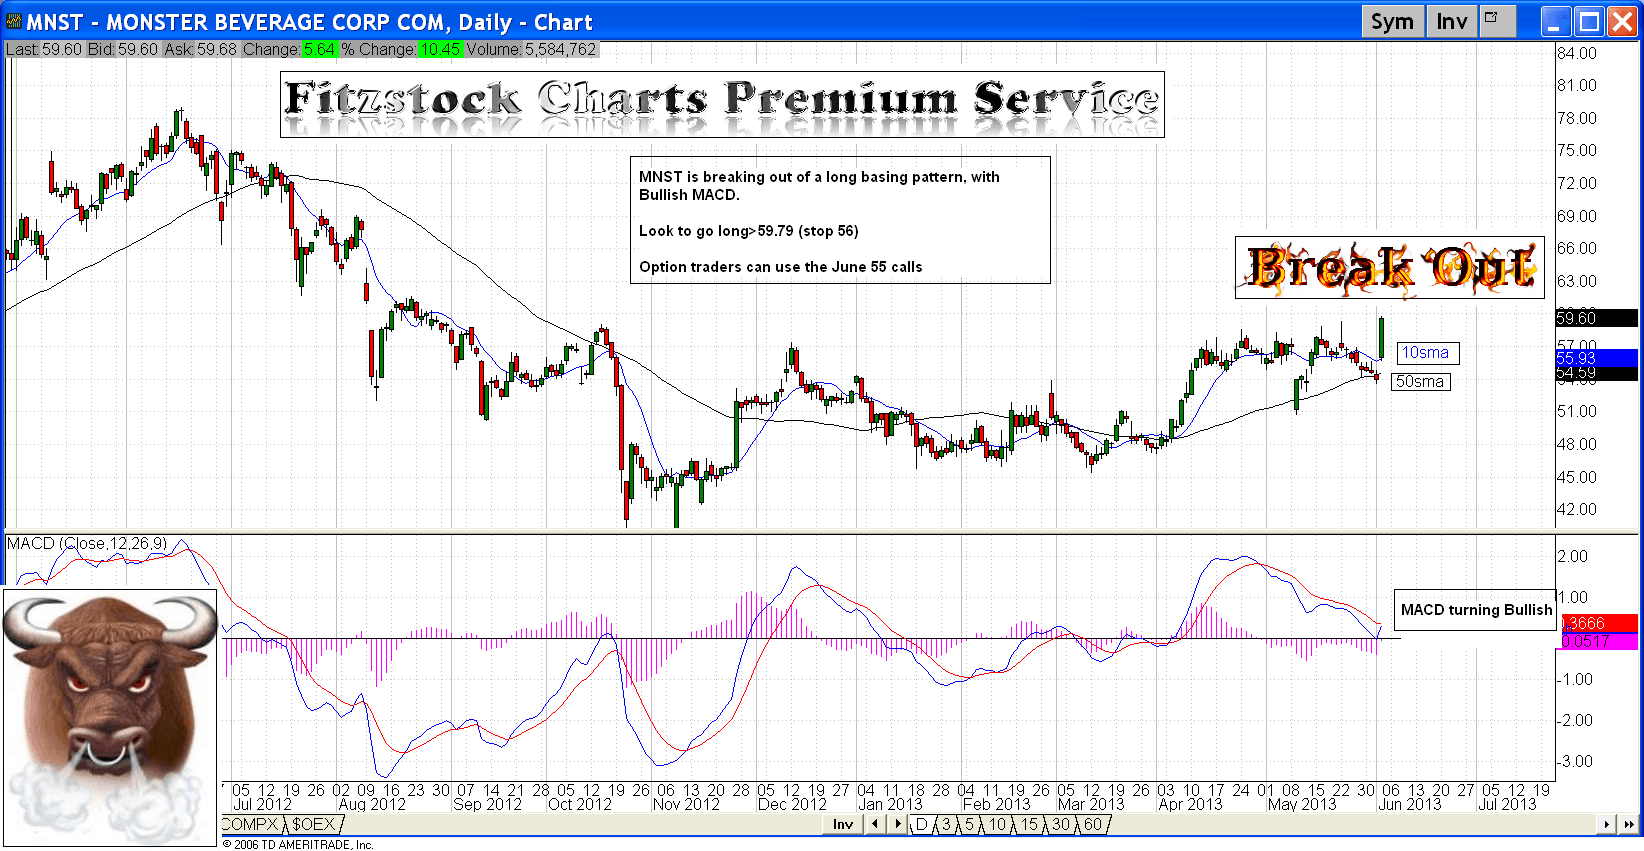 Mnst stock options